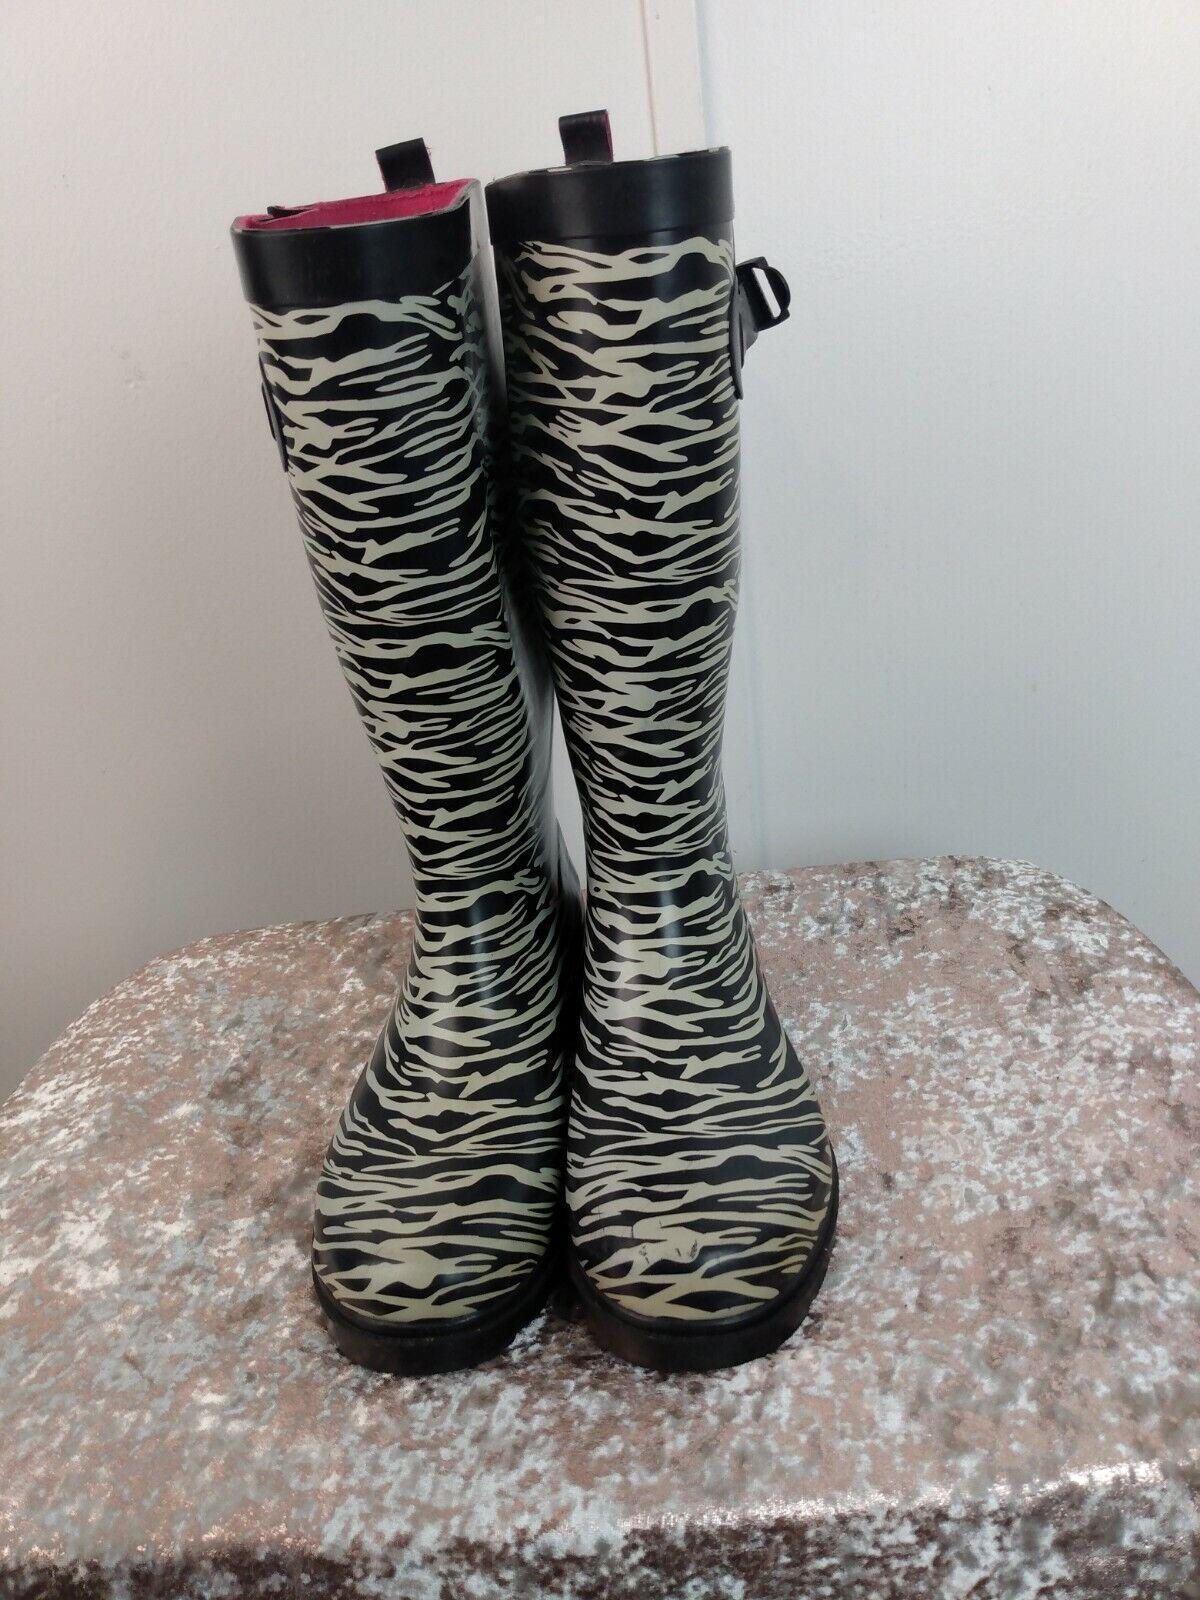 Capelli Zebra Print Rain Boots with Adjustable Ca… - image 3